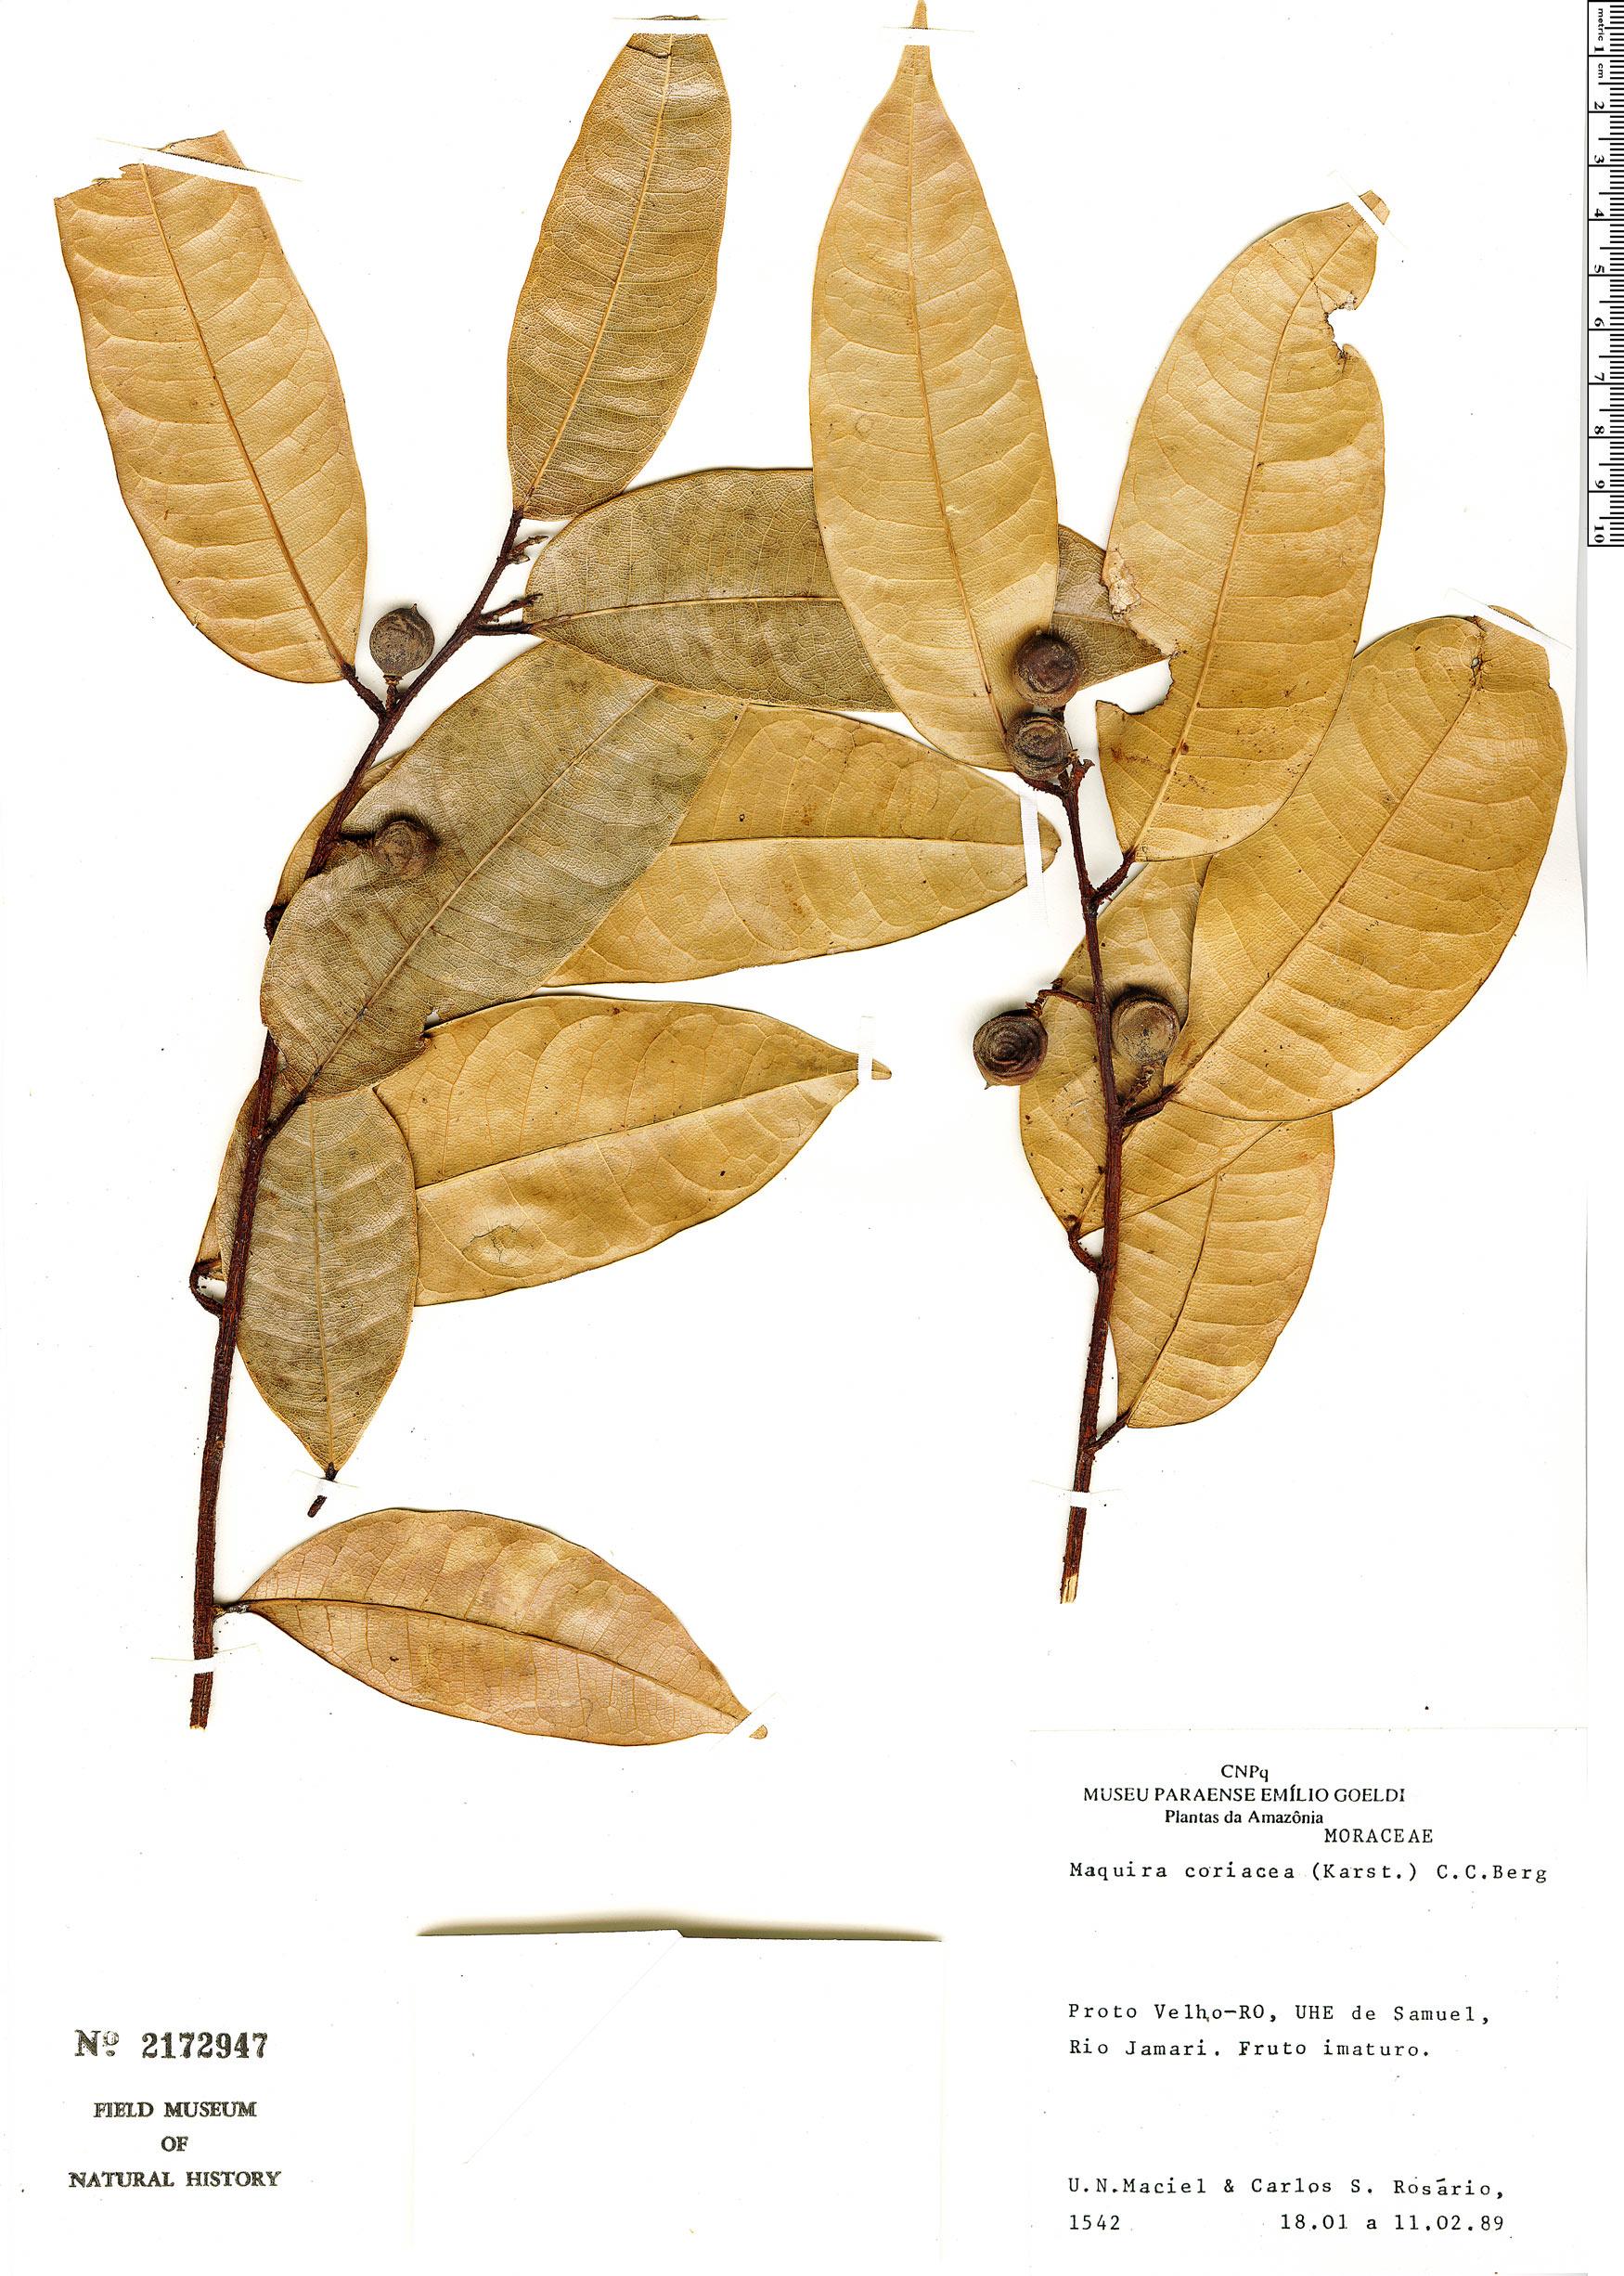 Espécimen: Maquira coriacea